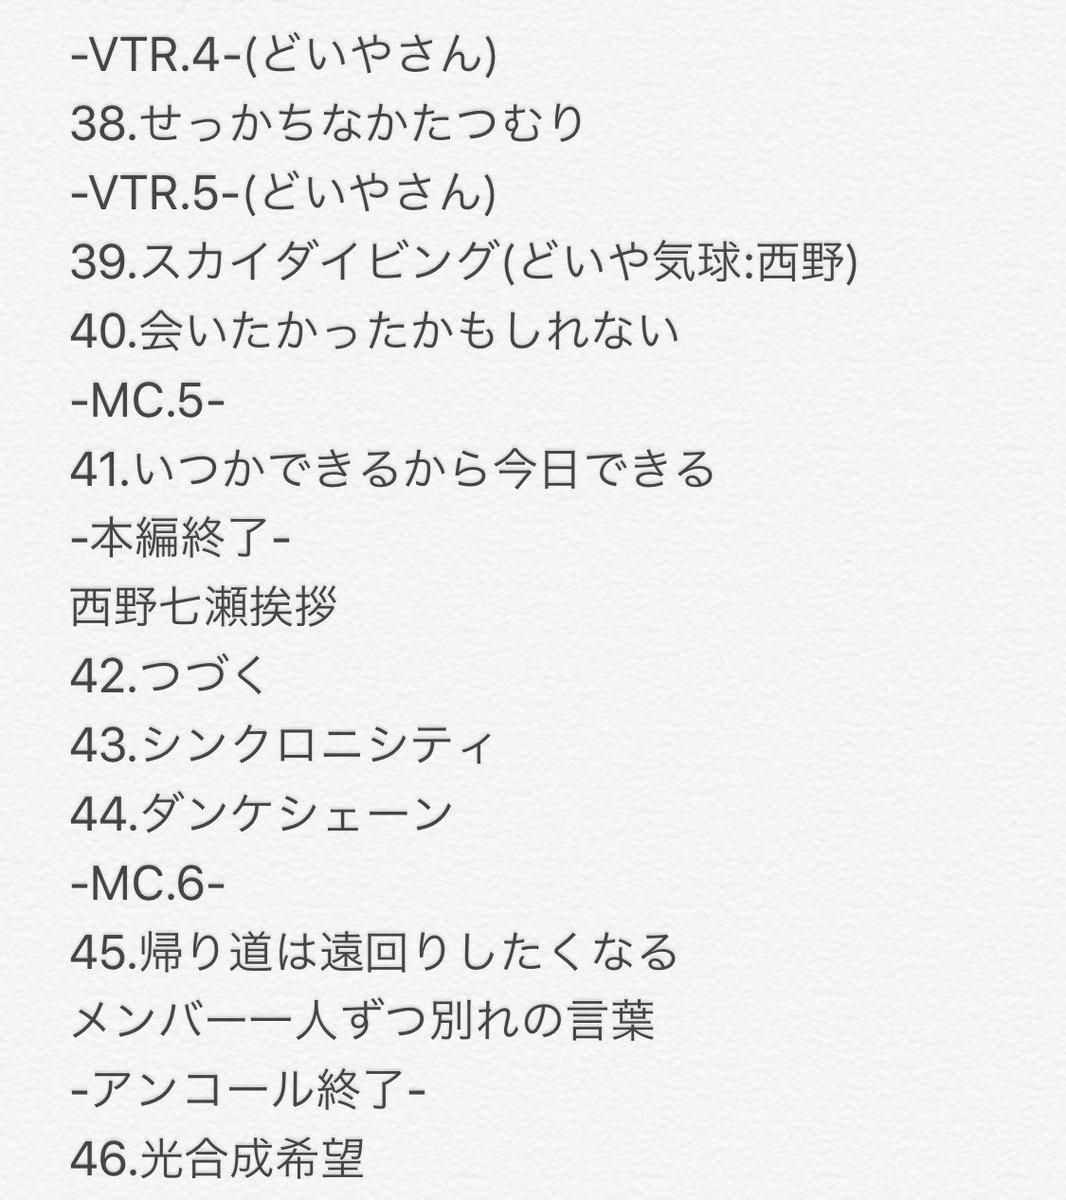 7thバスラ,高山一実,光合成希望,西野七瀬,卒コン,登場,卒業,201902244